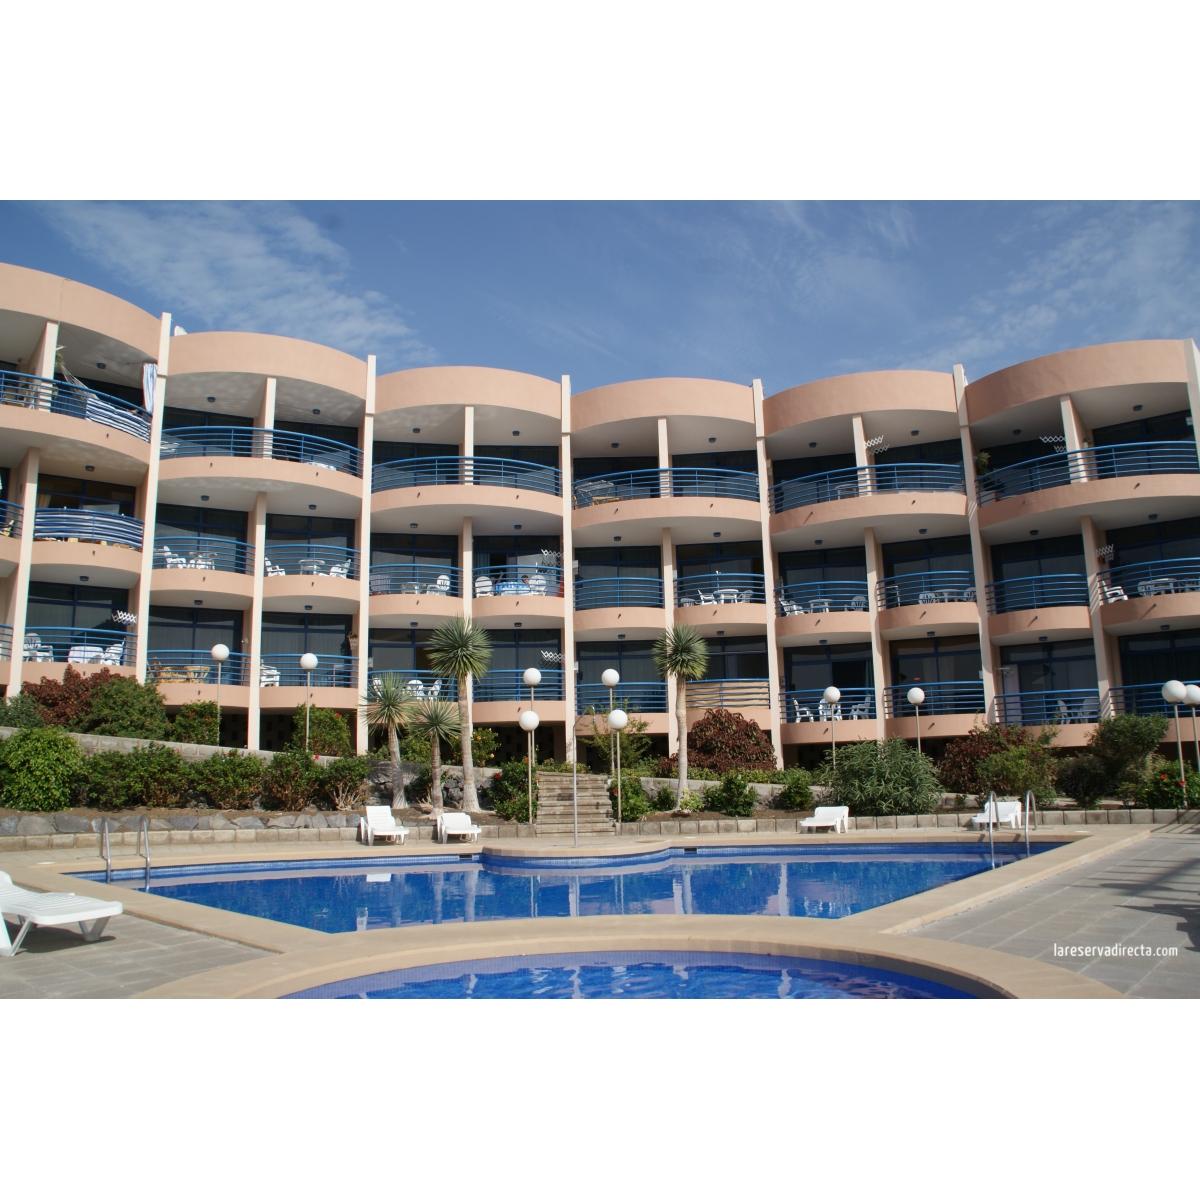 Apartments Los Lajones (Puerto Naos) Max 3 Pax - O.A.